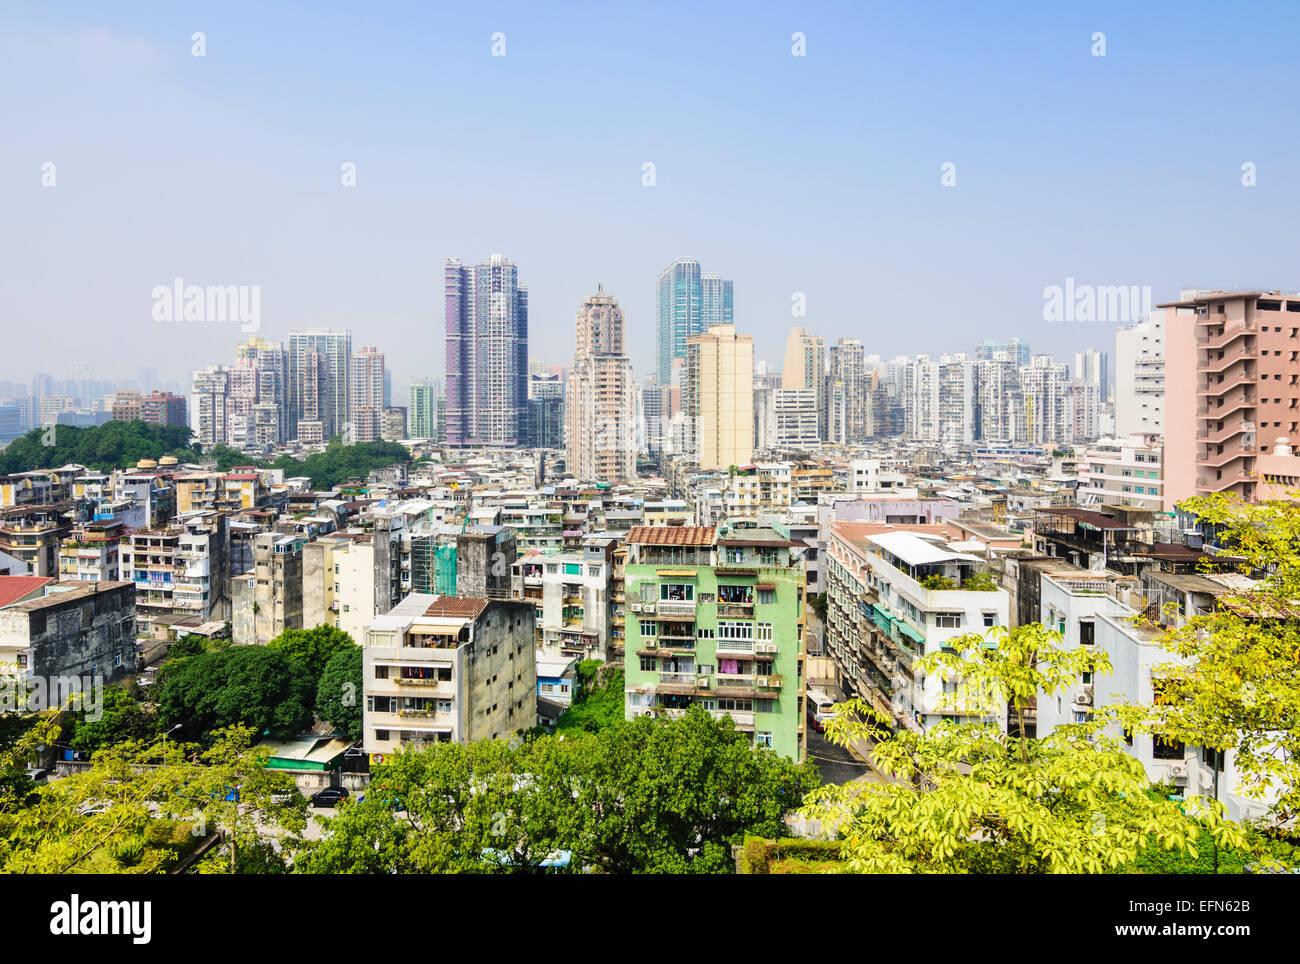 Skyline de Macao, Chine Photo Stock